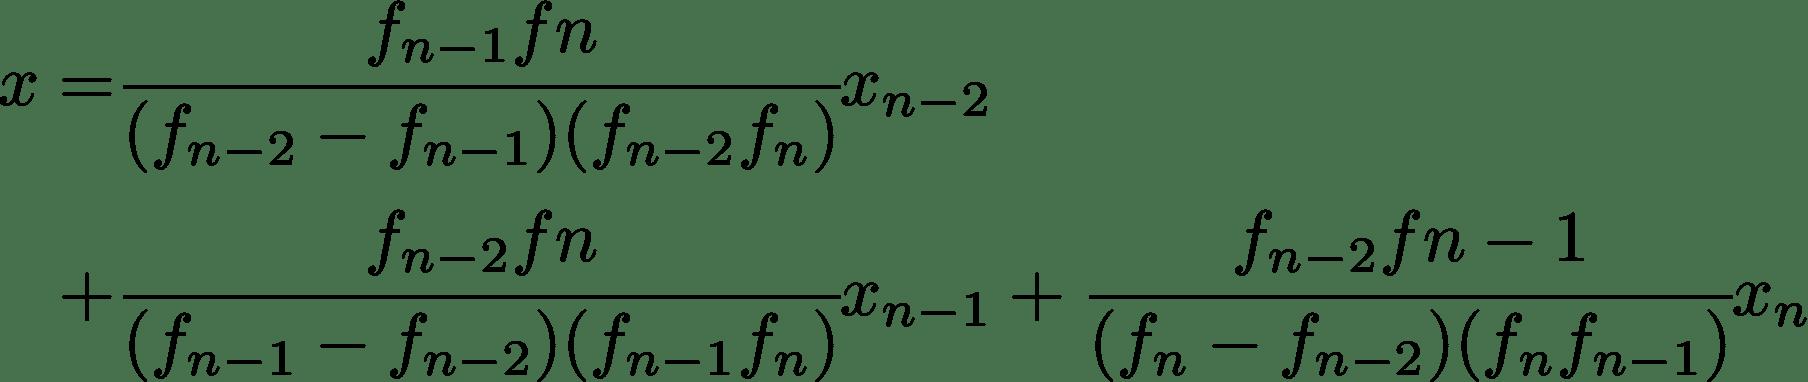 Inverse_quadratic_interpolation.png